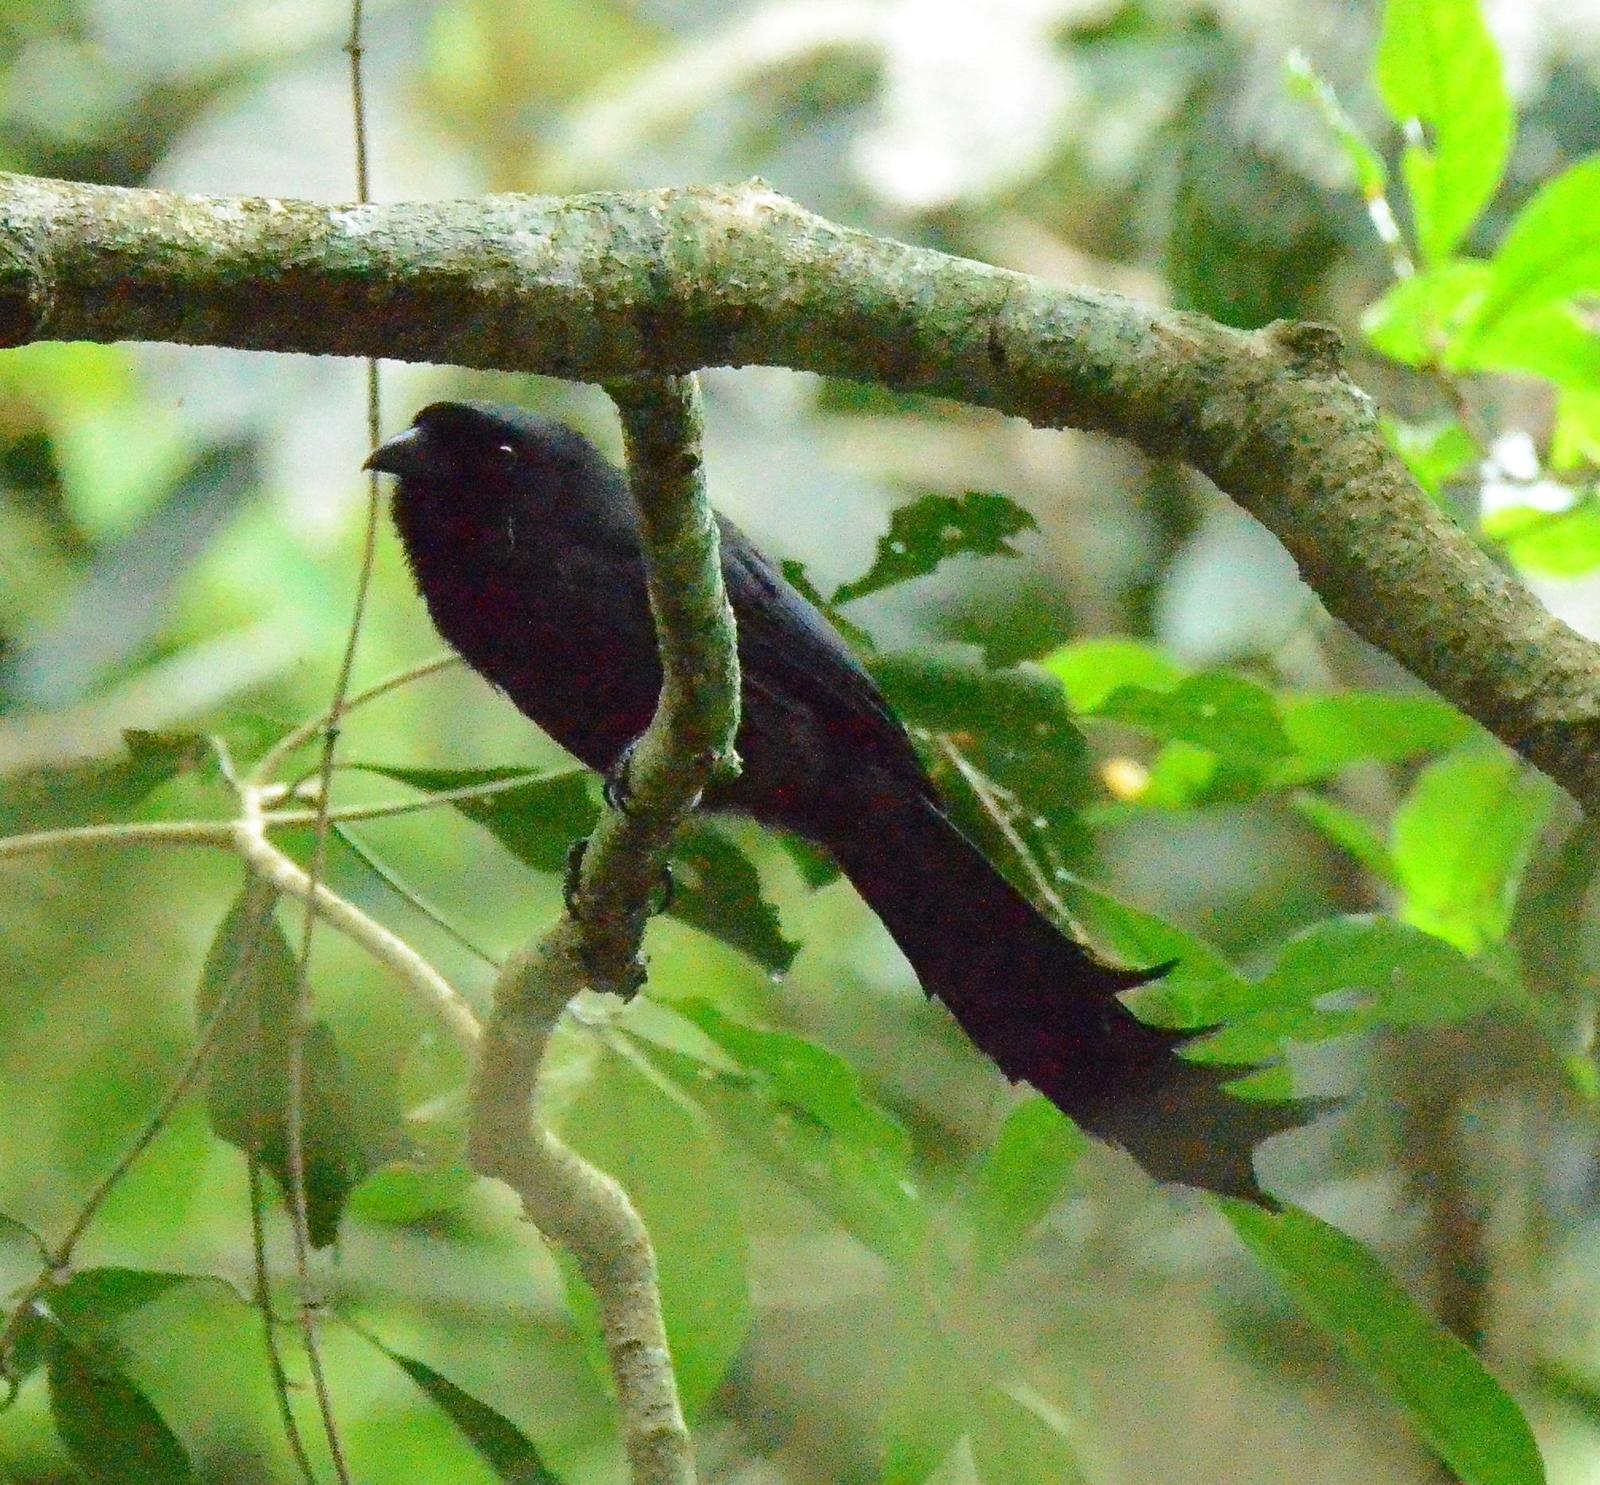 Ratchet-tailed Treepie Photo by Uthai Cheummarung